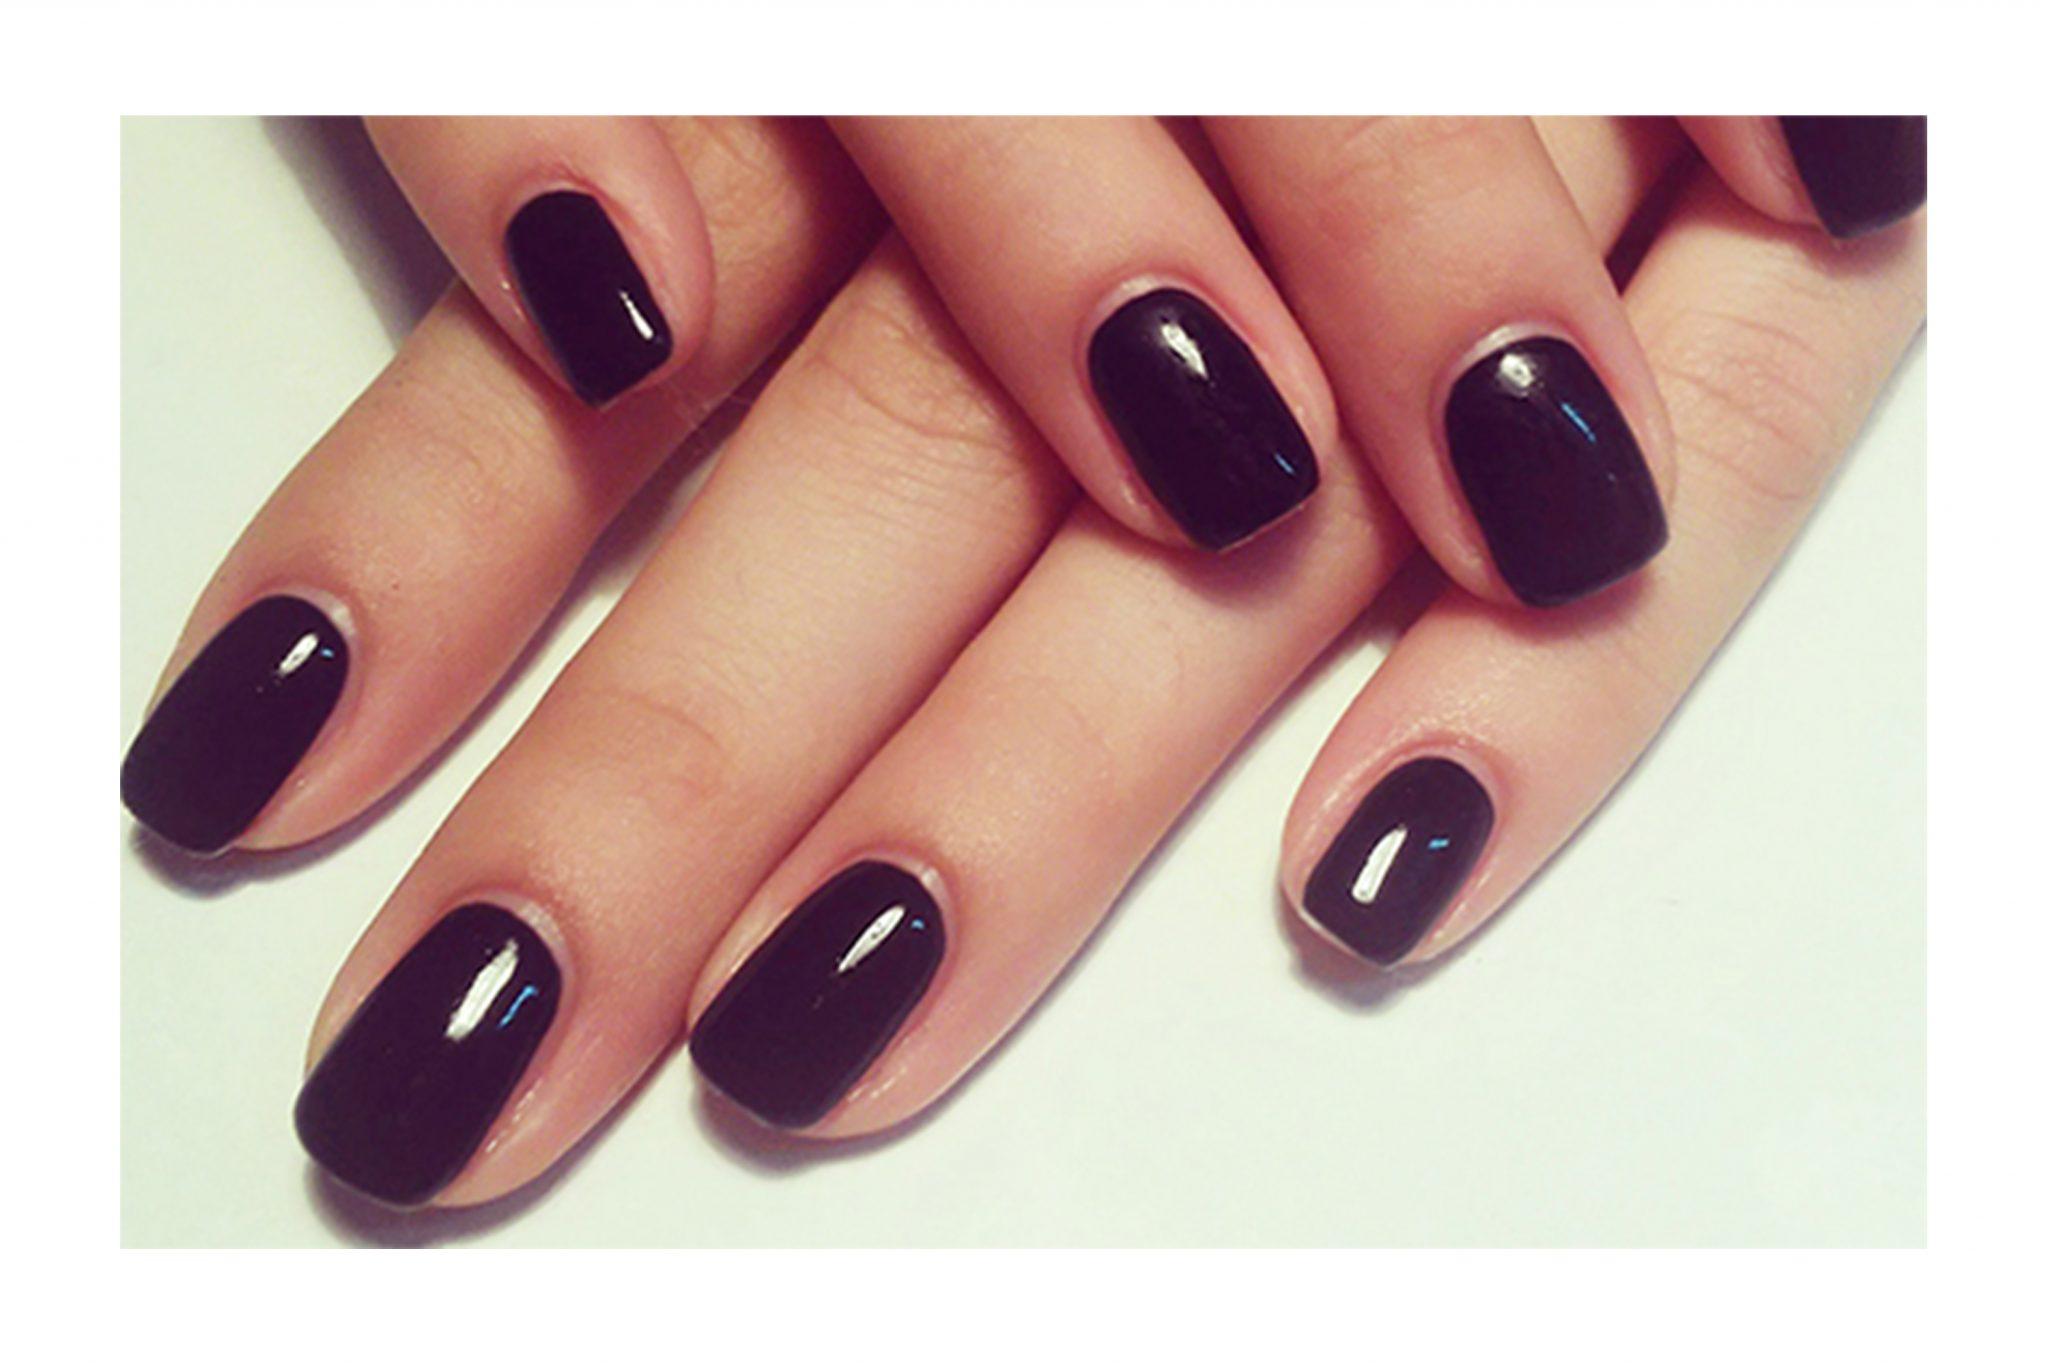 Novi trend: `Lipstick` nokti osvajaju Instagram! - Teen385.com